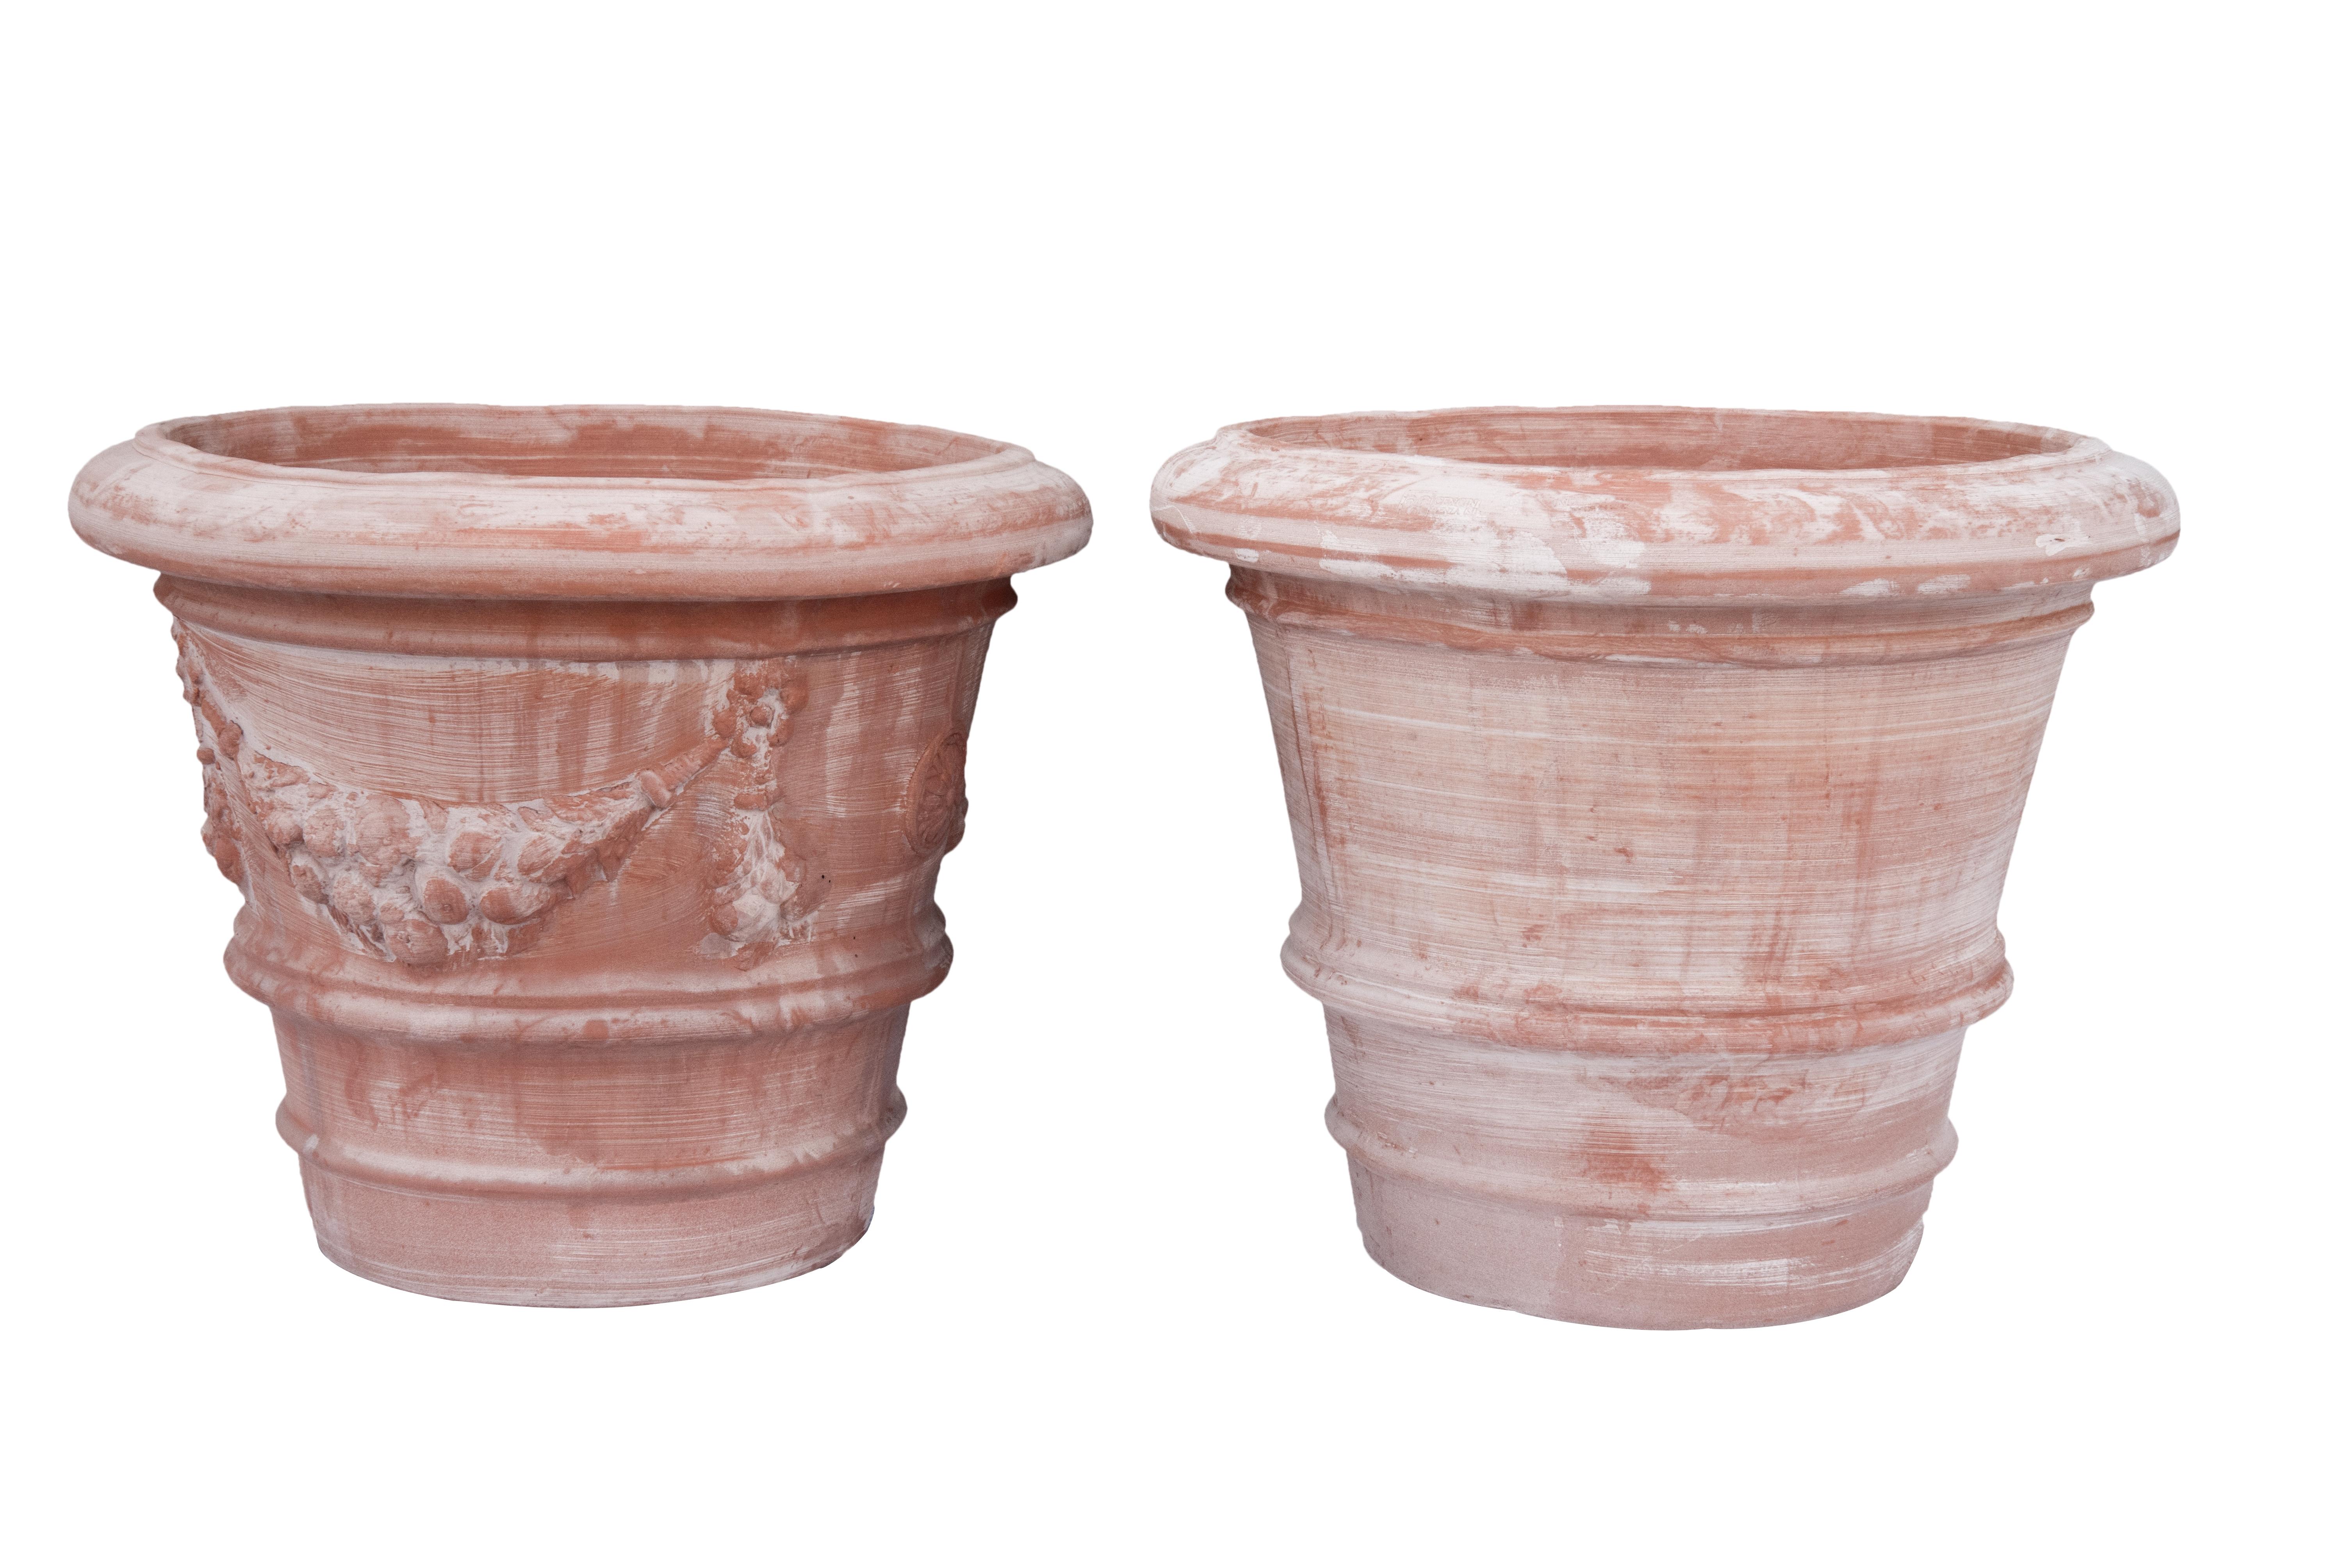 Vaso Pienza in Terracotta